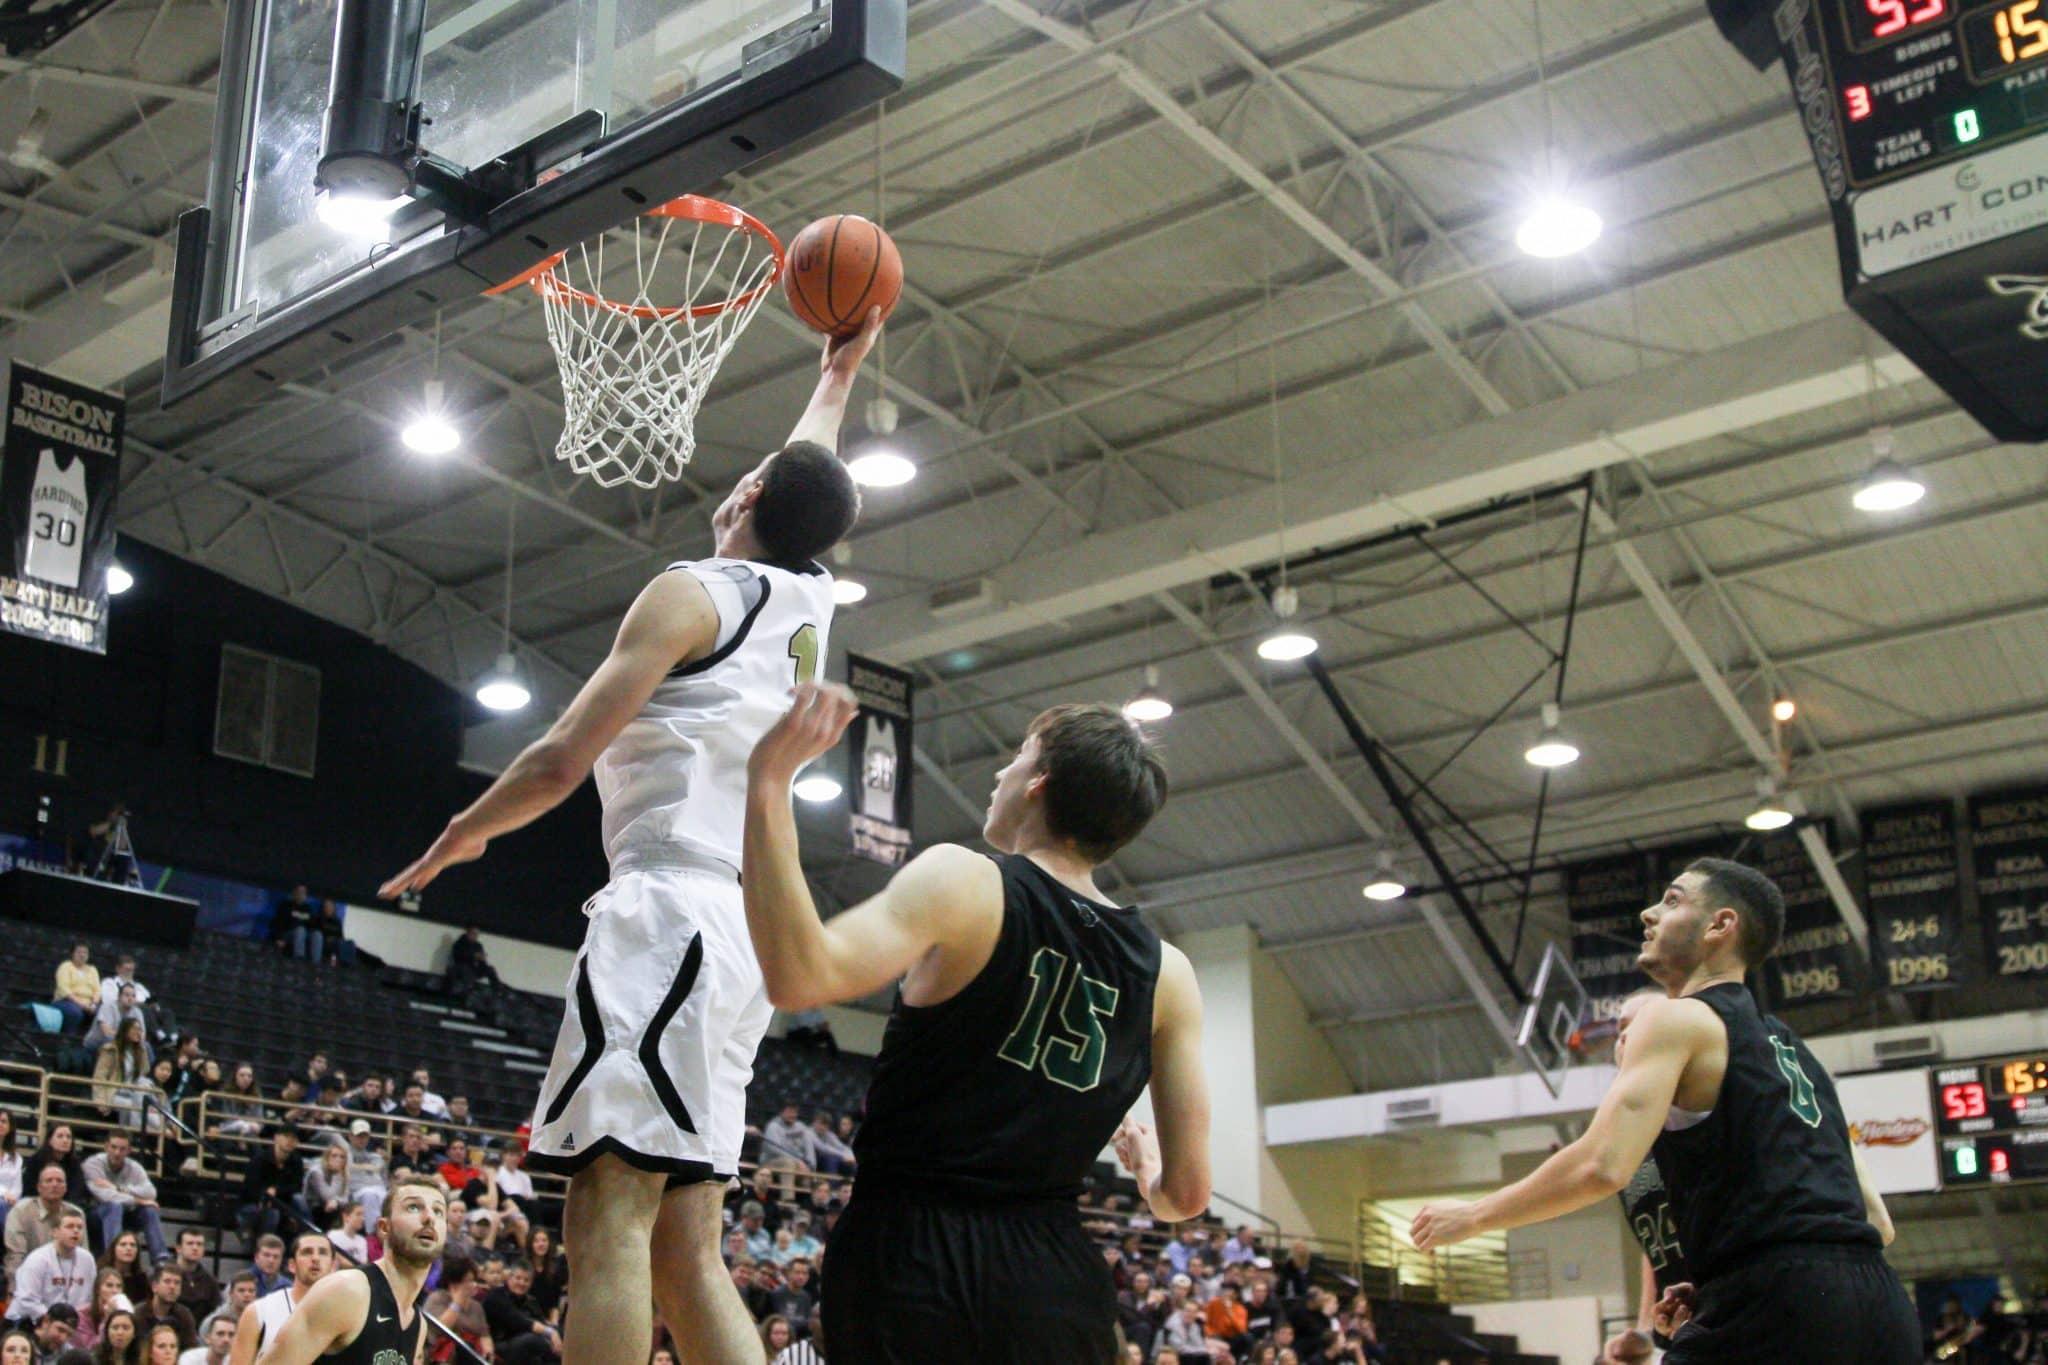 Men's Basketball Continues Winning Streak | The Bison